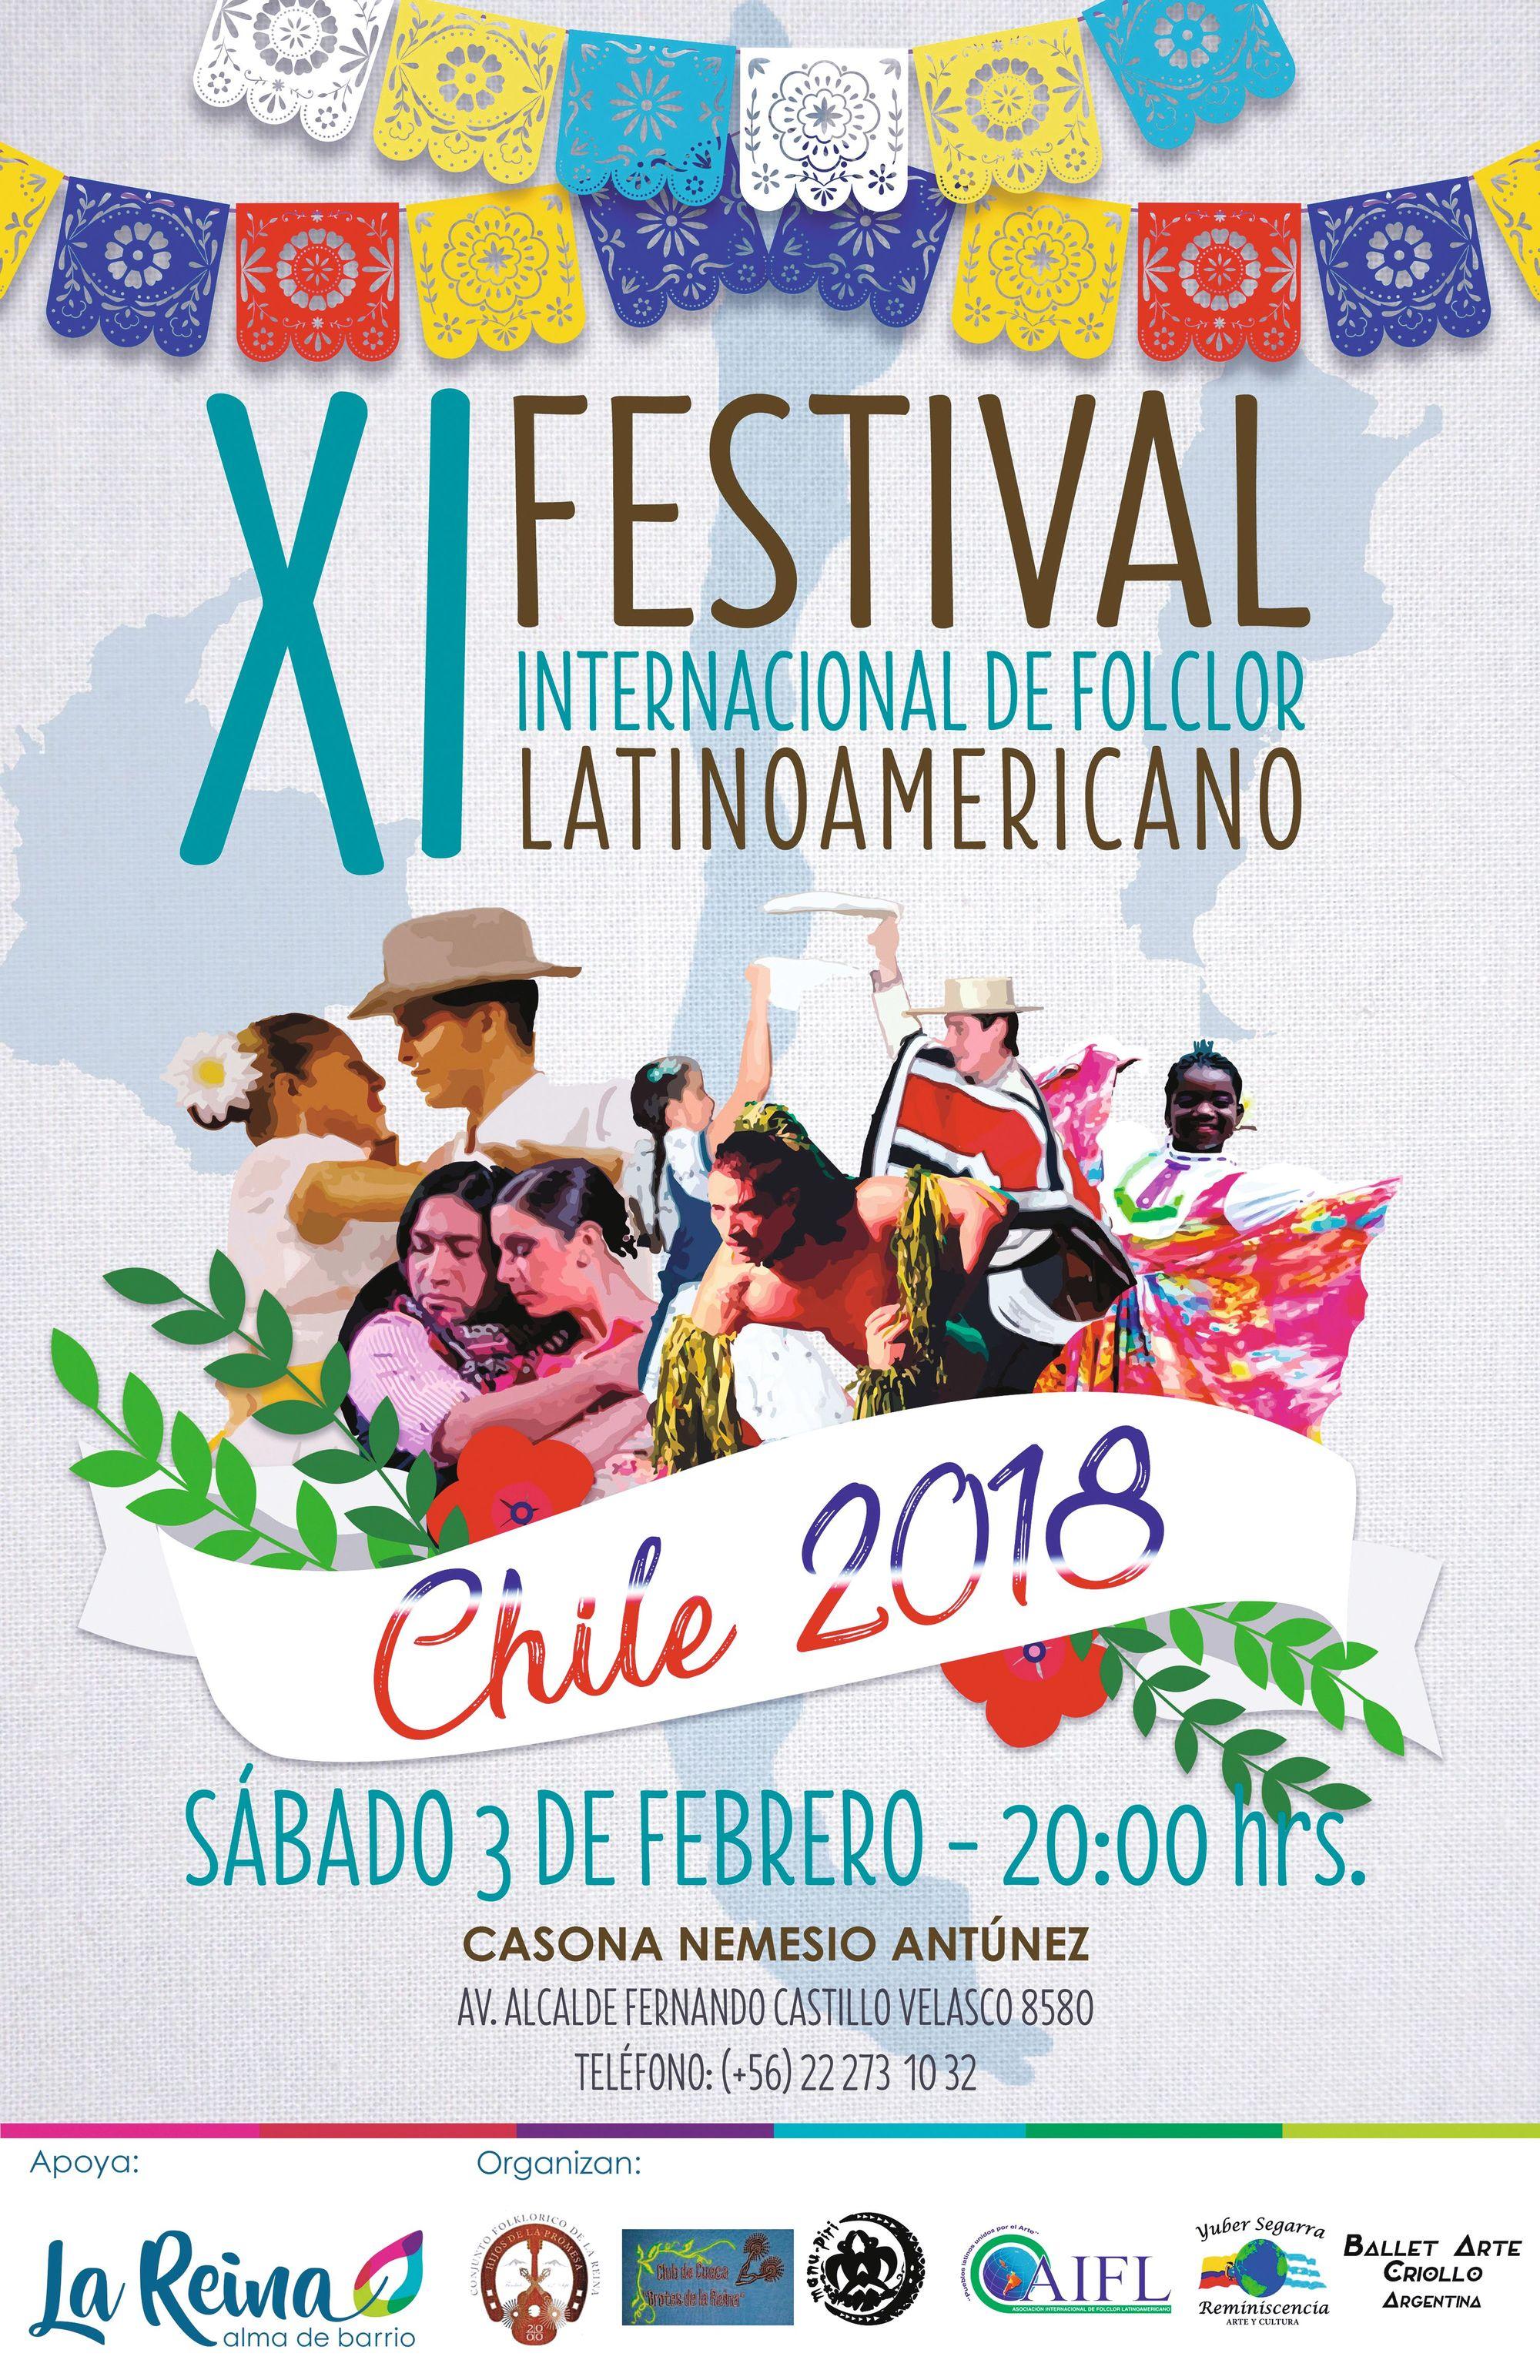 Cartel Festival Folclor Latinoamericano, 2018.